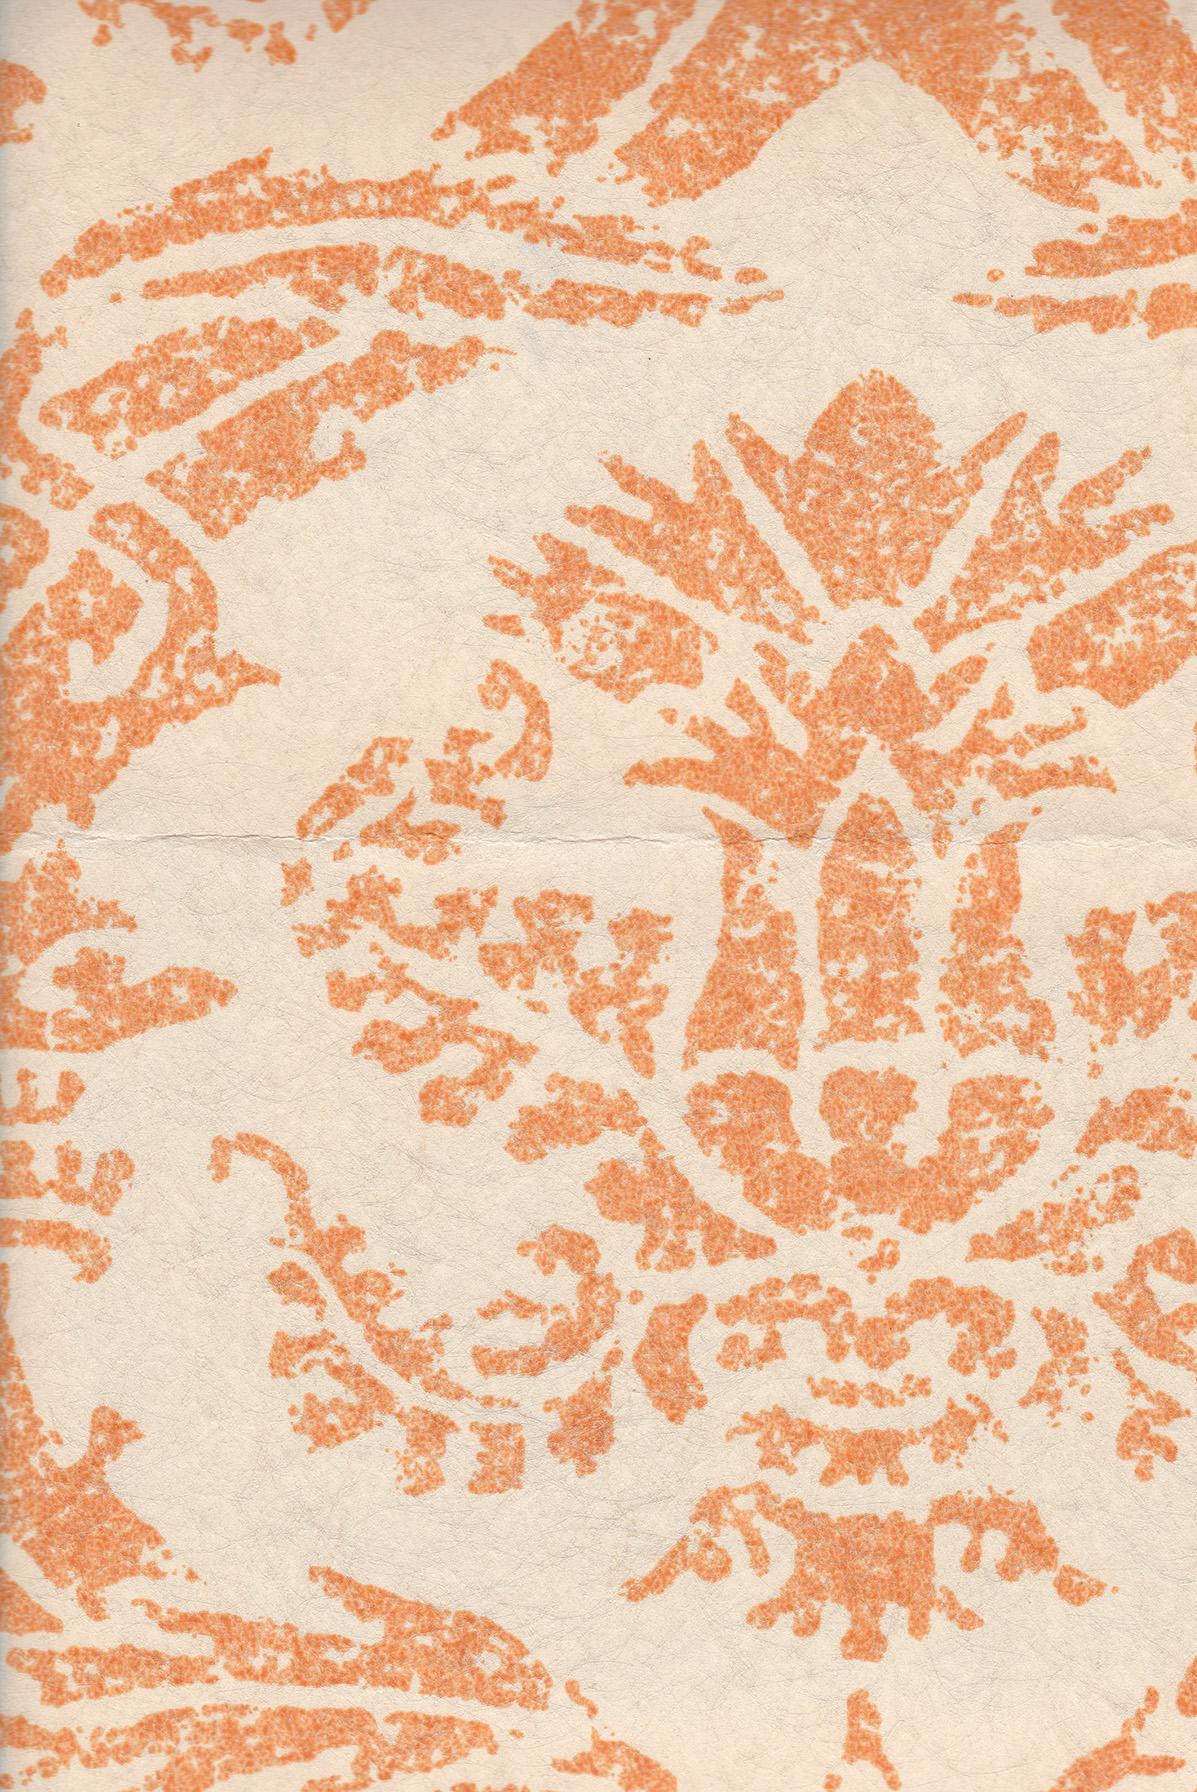 izmir | tangerine color on almond wallpaper